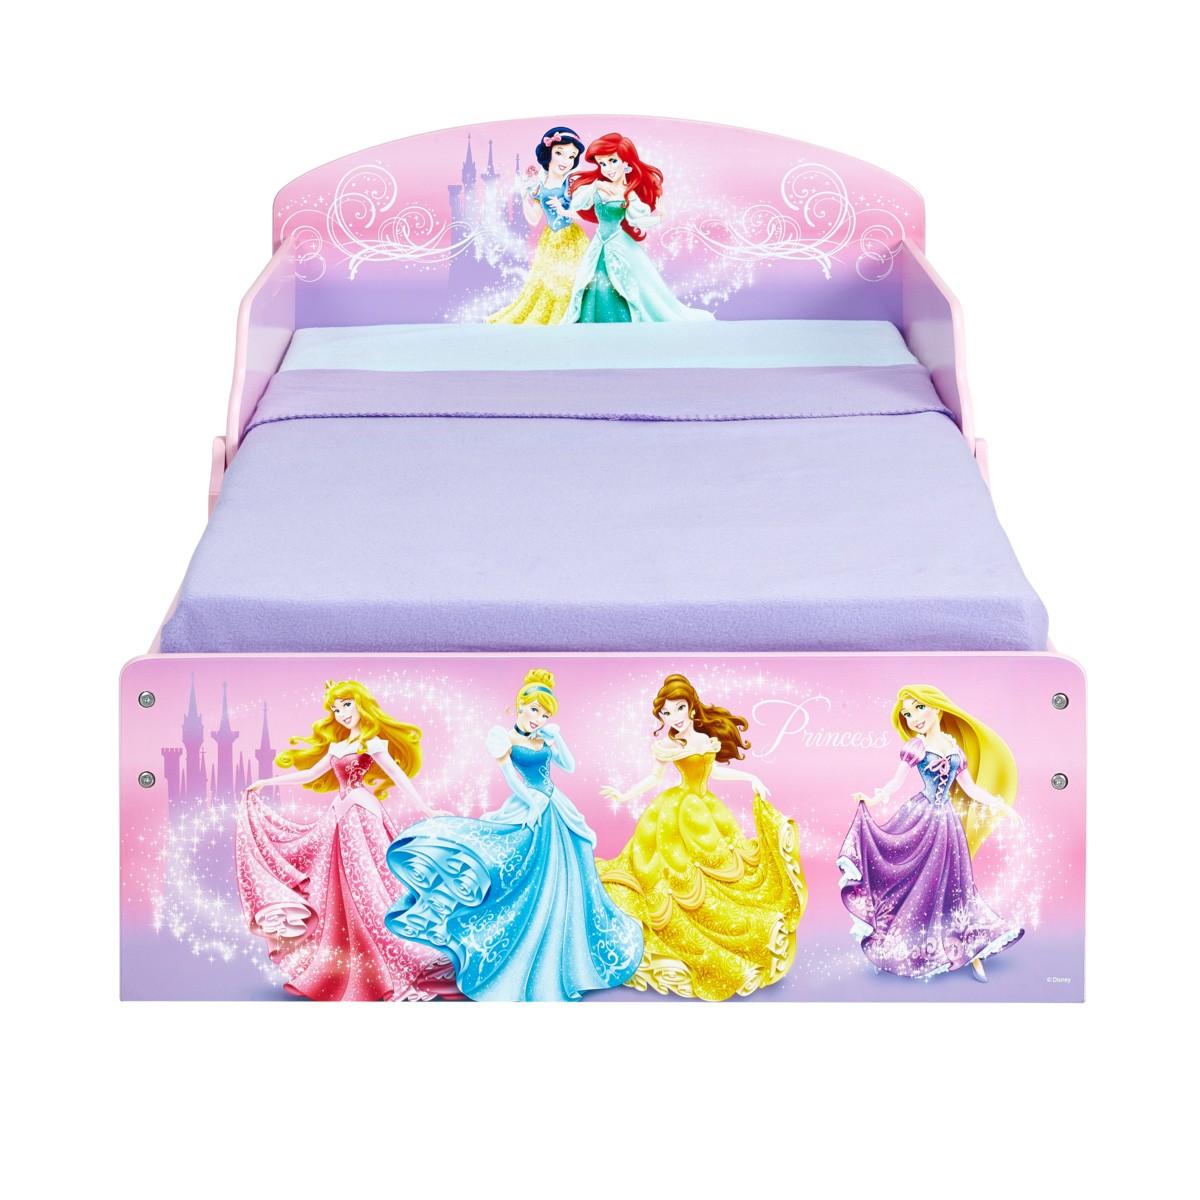 Disney Princess Toddler Bed | Stay At Home Mum